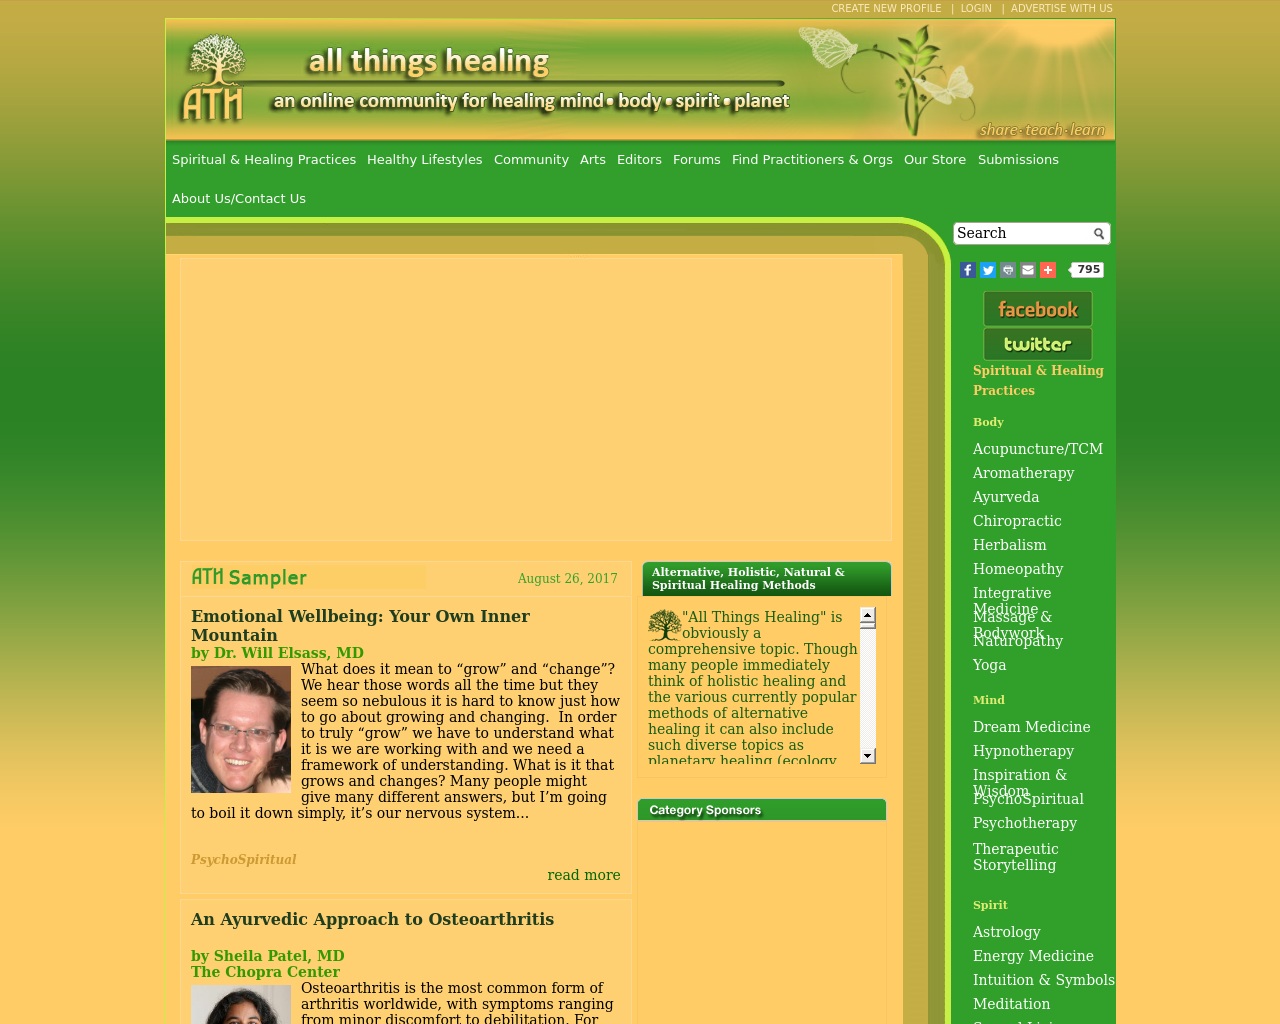 All-Things-Healing-Advertising-Reviews-Pricing